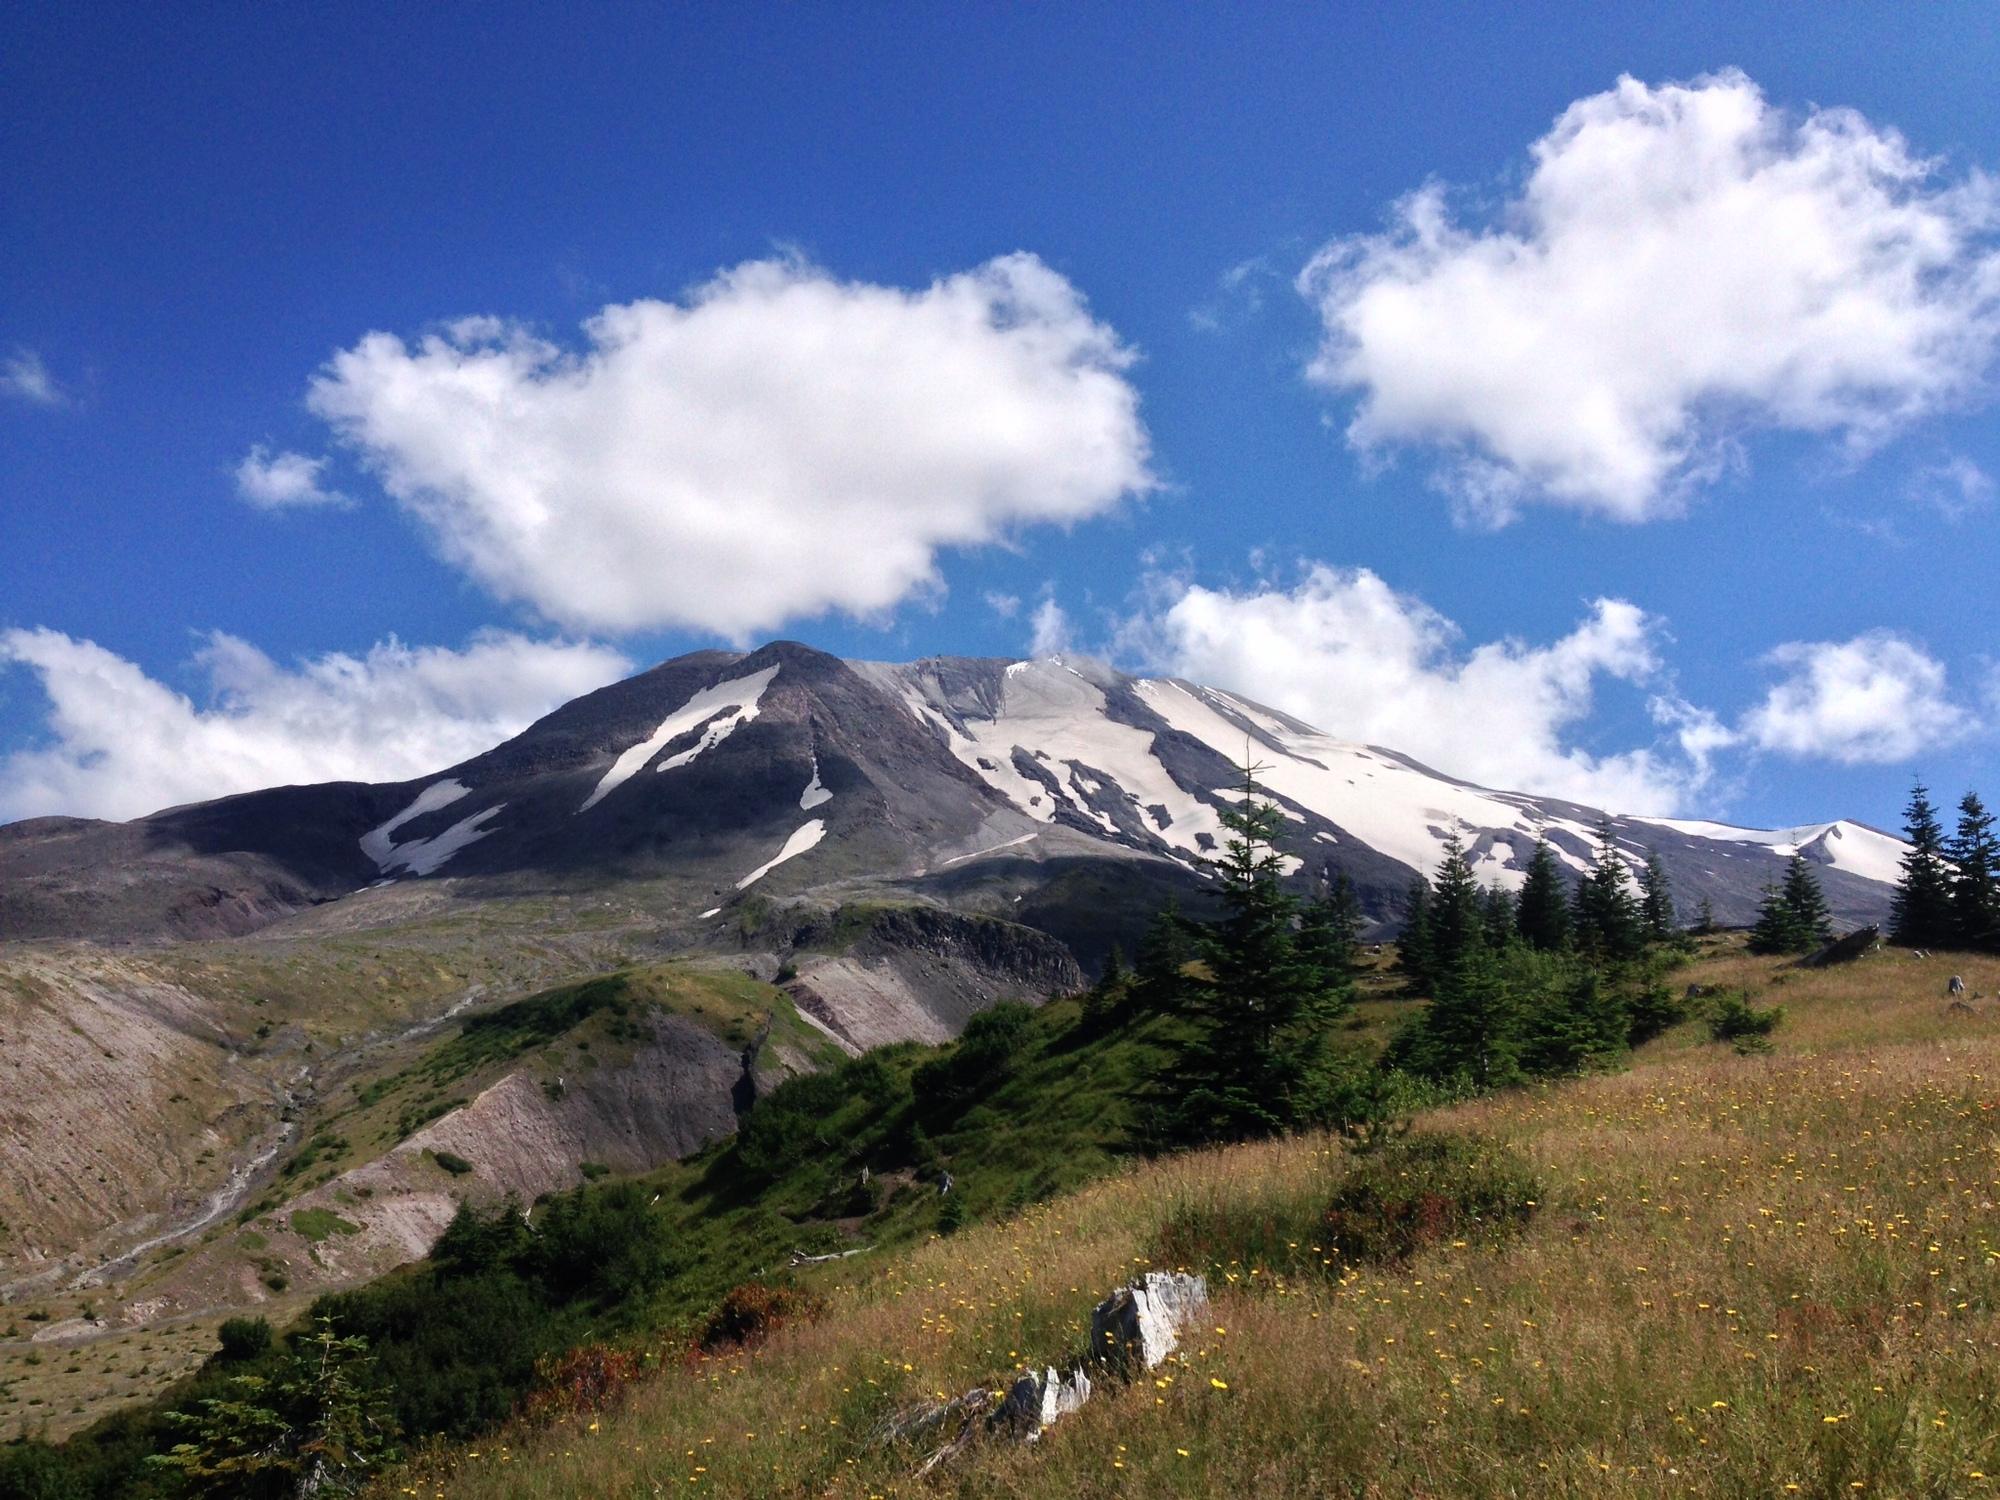 Backpacking Loowit Trail, Washington